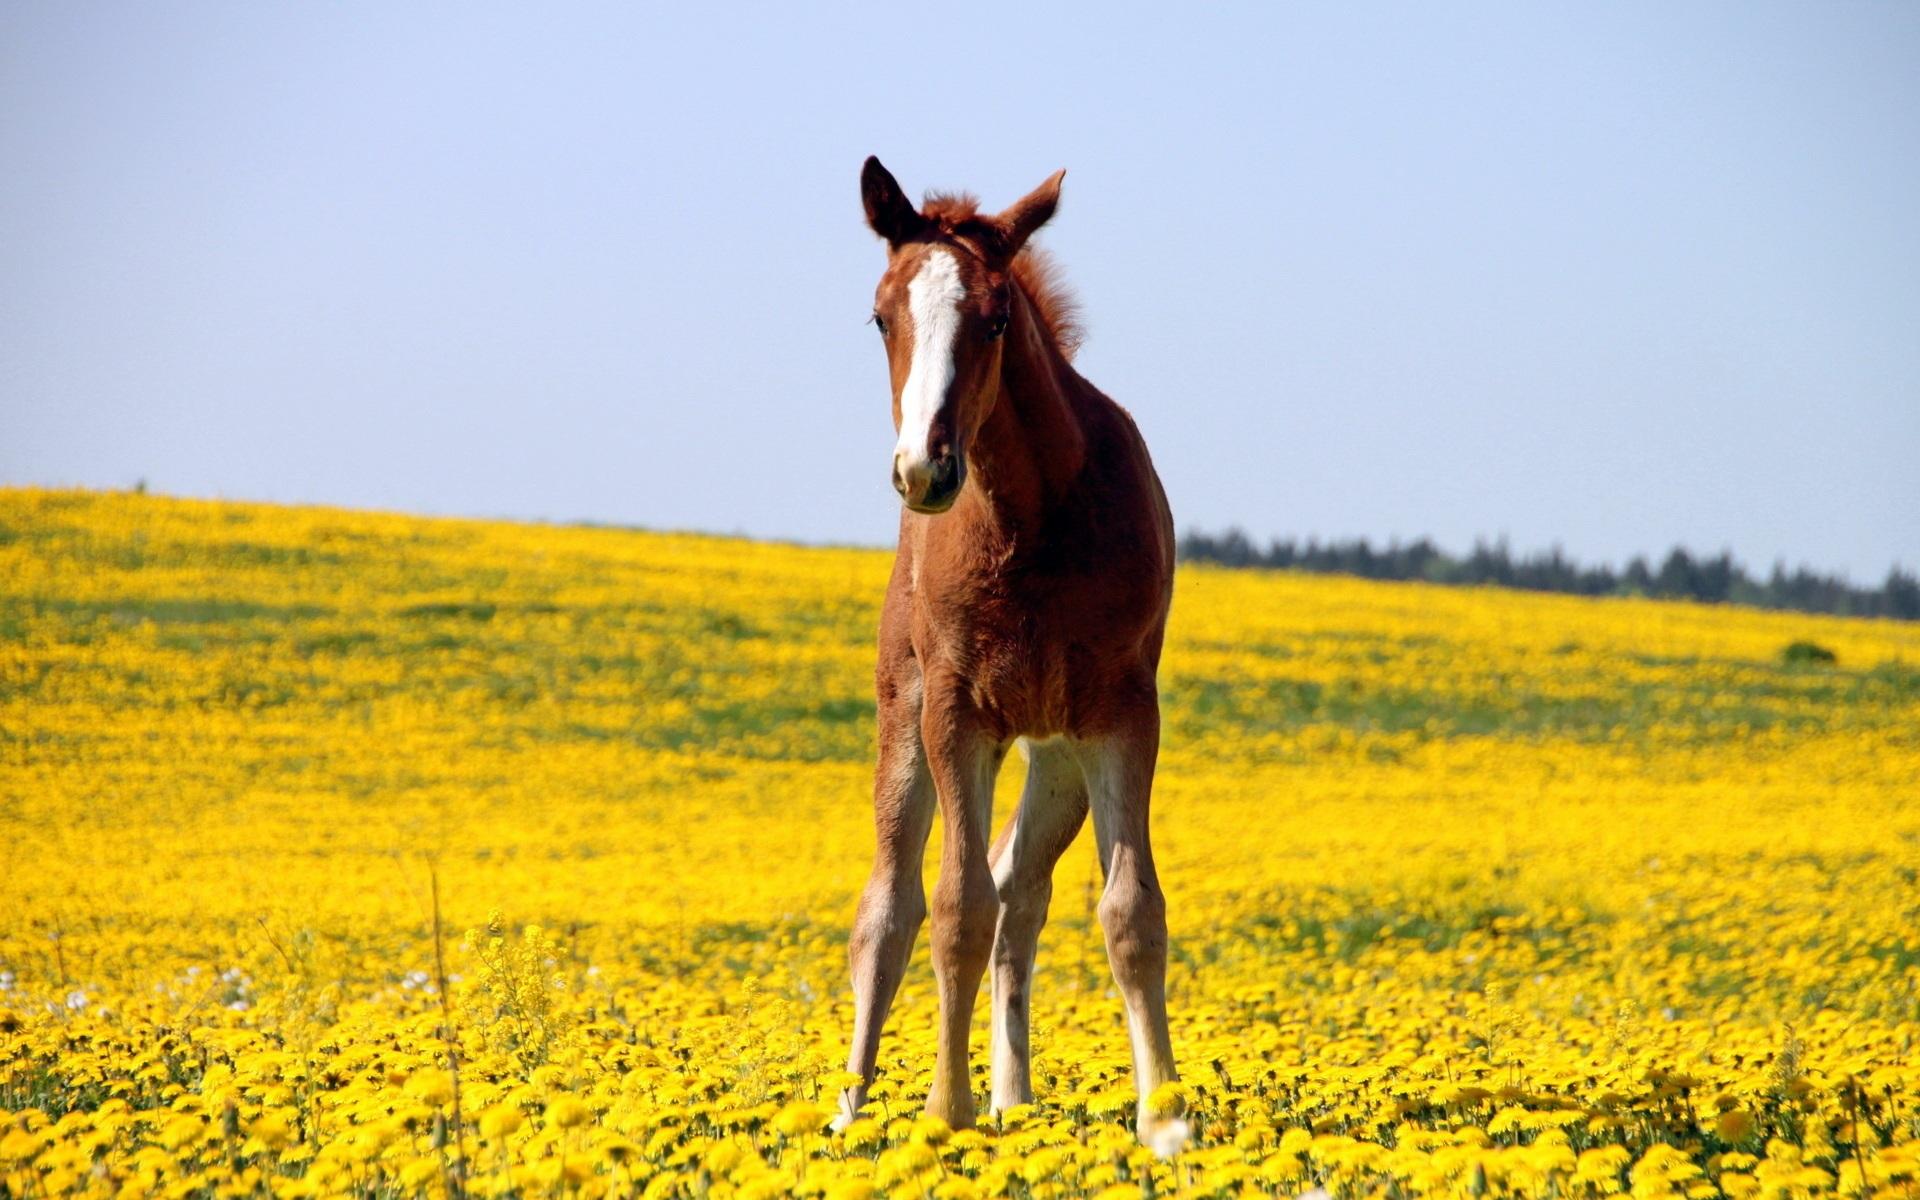 brown and white horse widescreen desktop wallpaper 1175